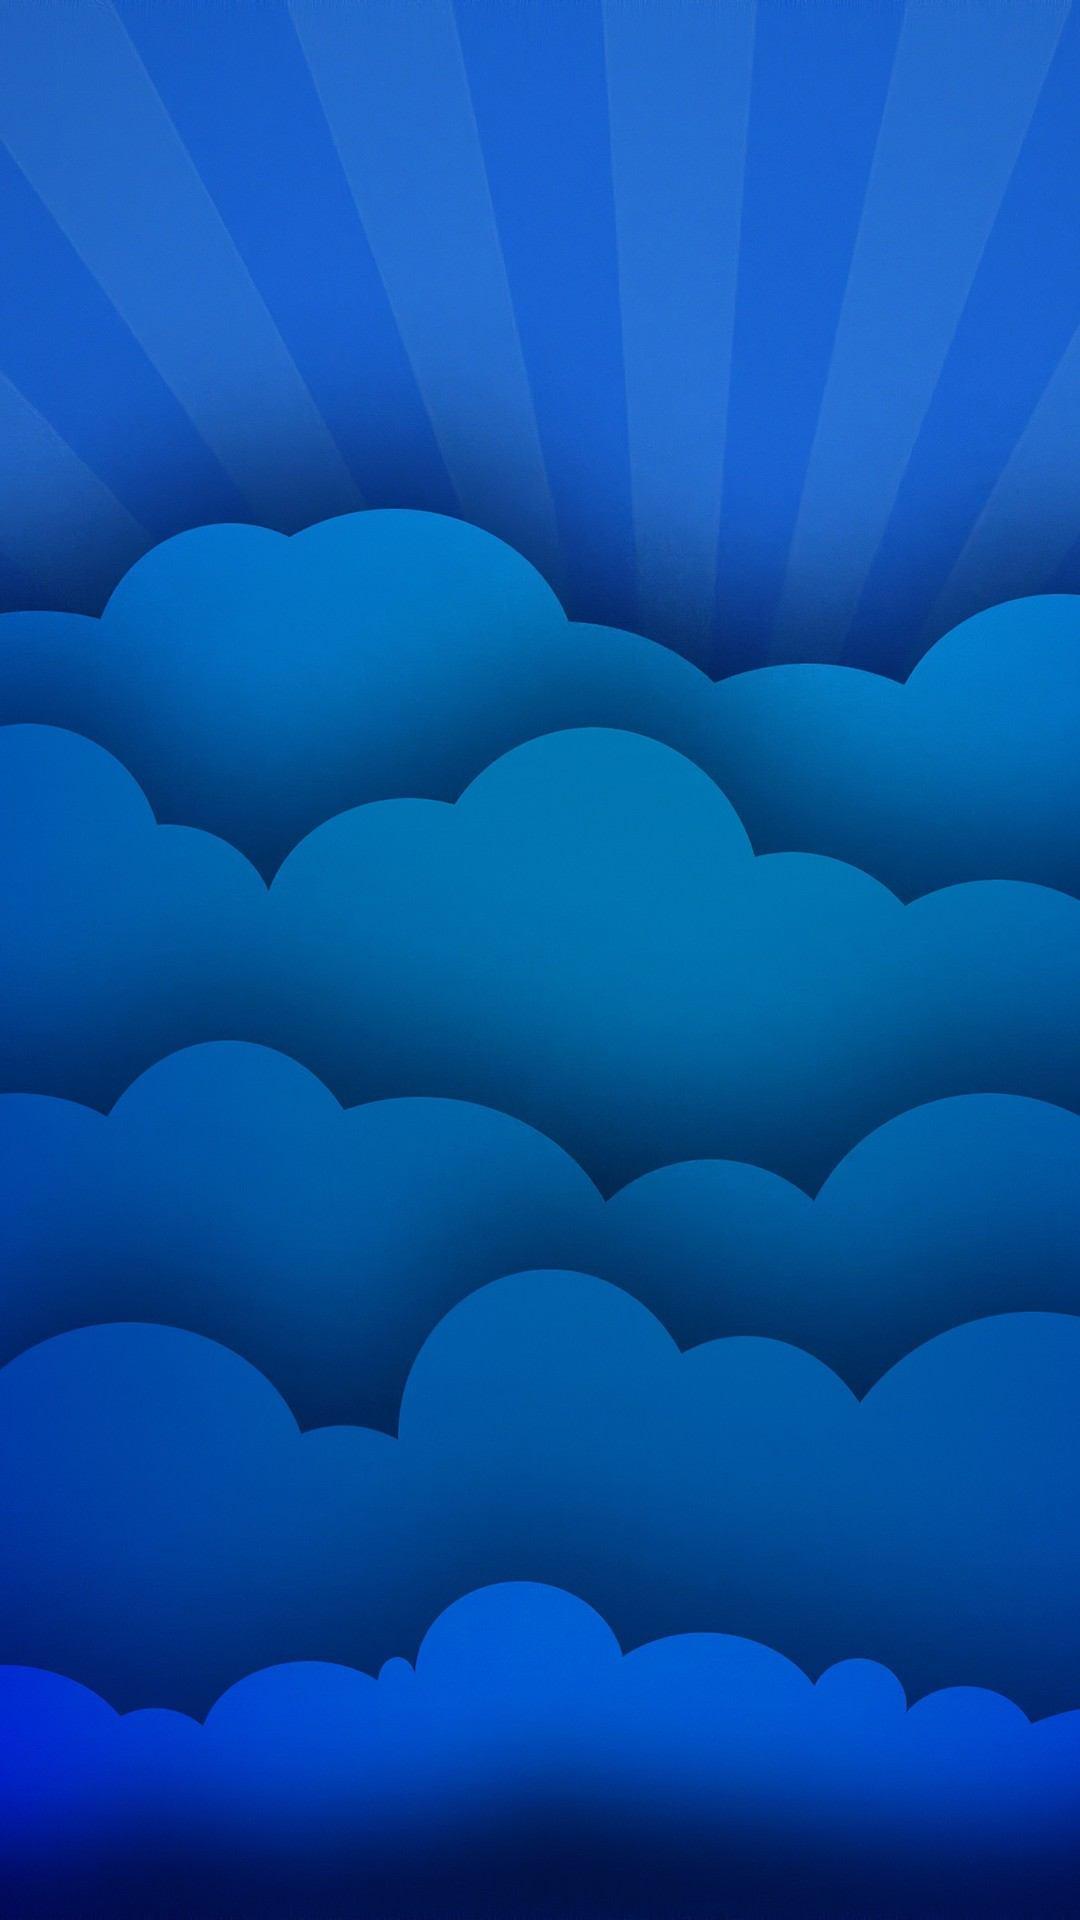 blue clouds minimal art 4k xk 1080x1920 - Pack de Fondos de Pantalla Minimalistas (+100 Imagenes)